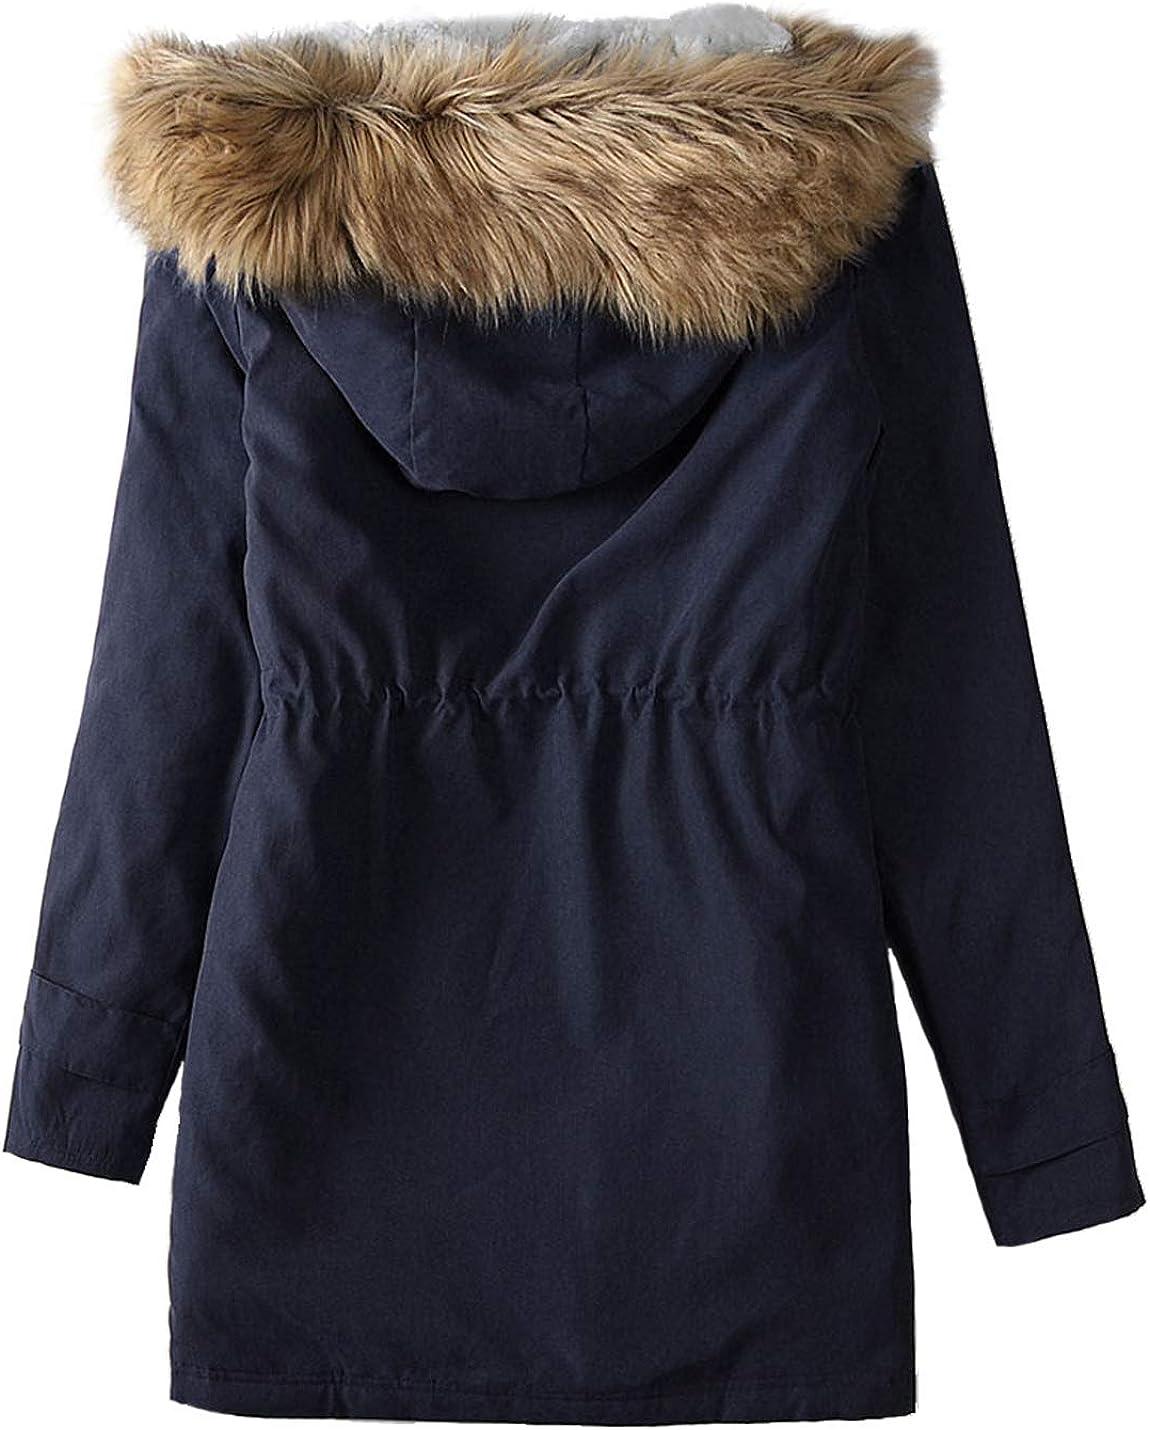 D.B.M Womens Slim Thick Warmth Drawstring Zipper Hooded Fur Collar Coat